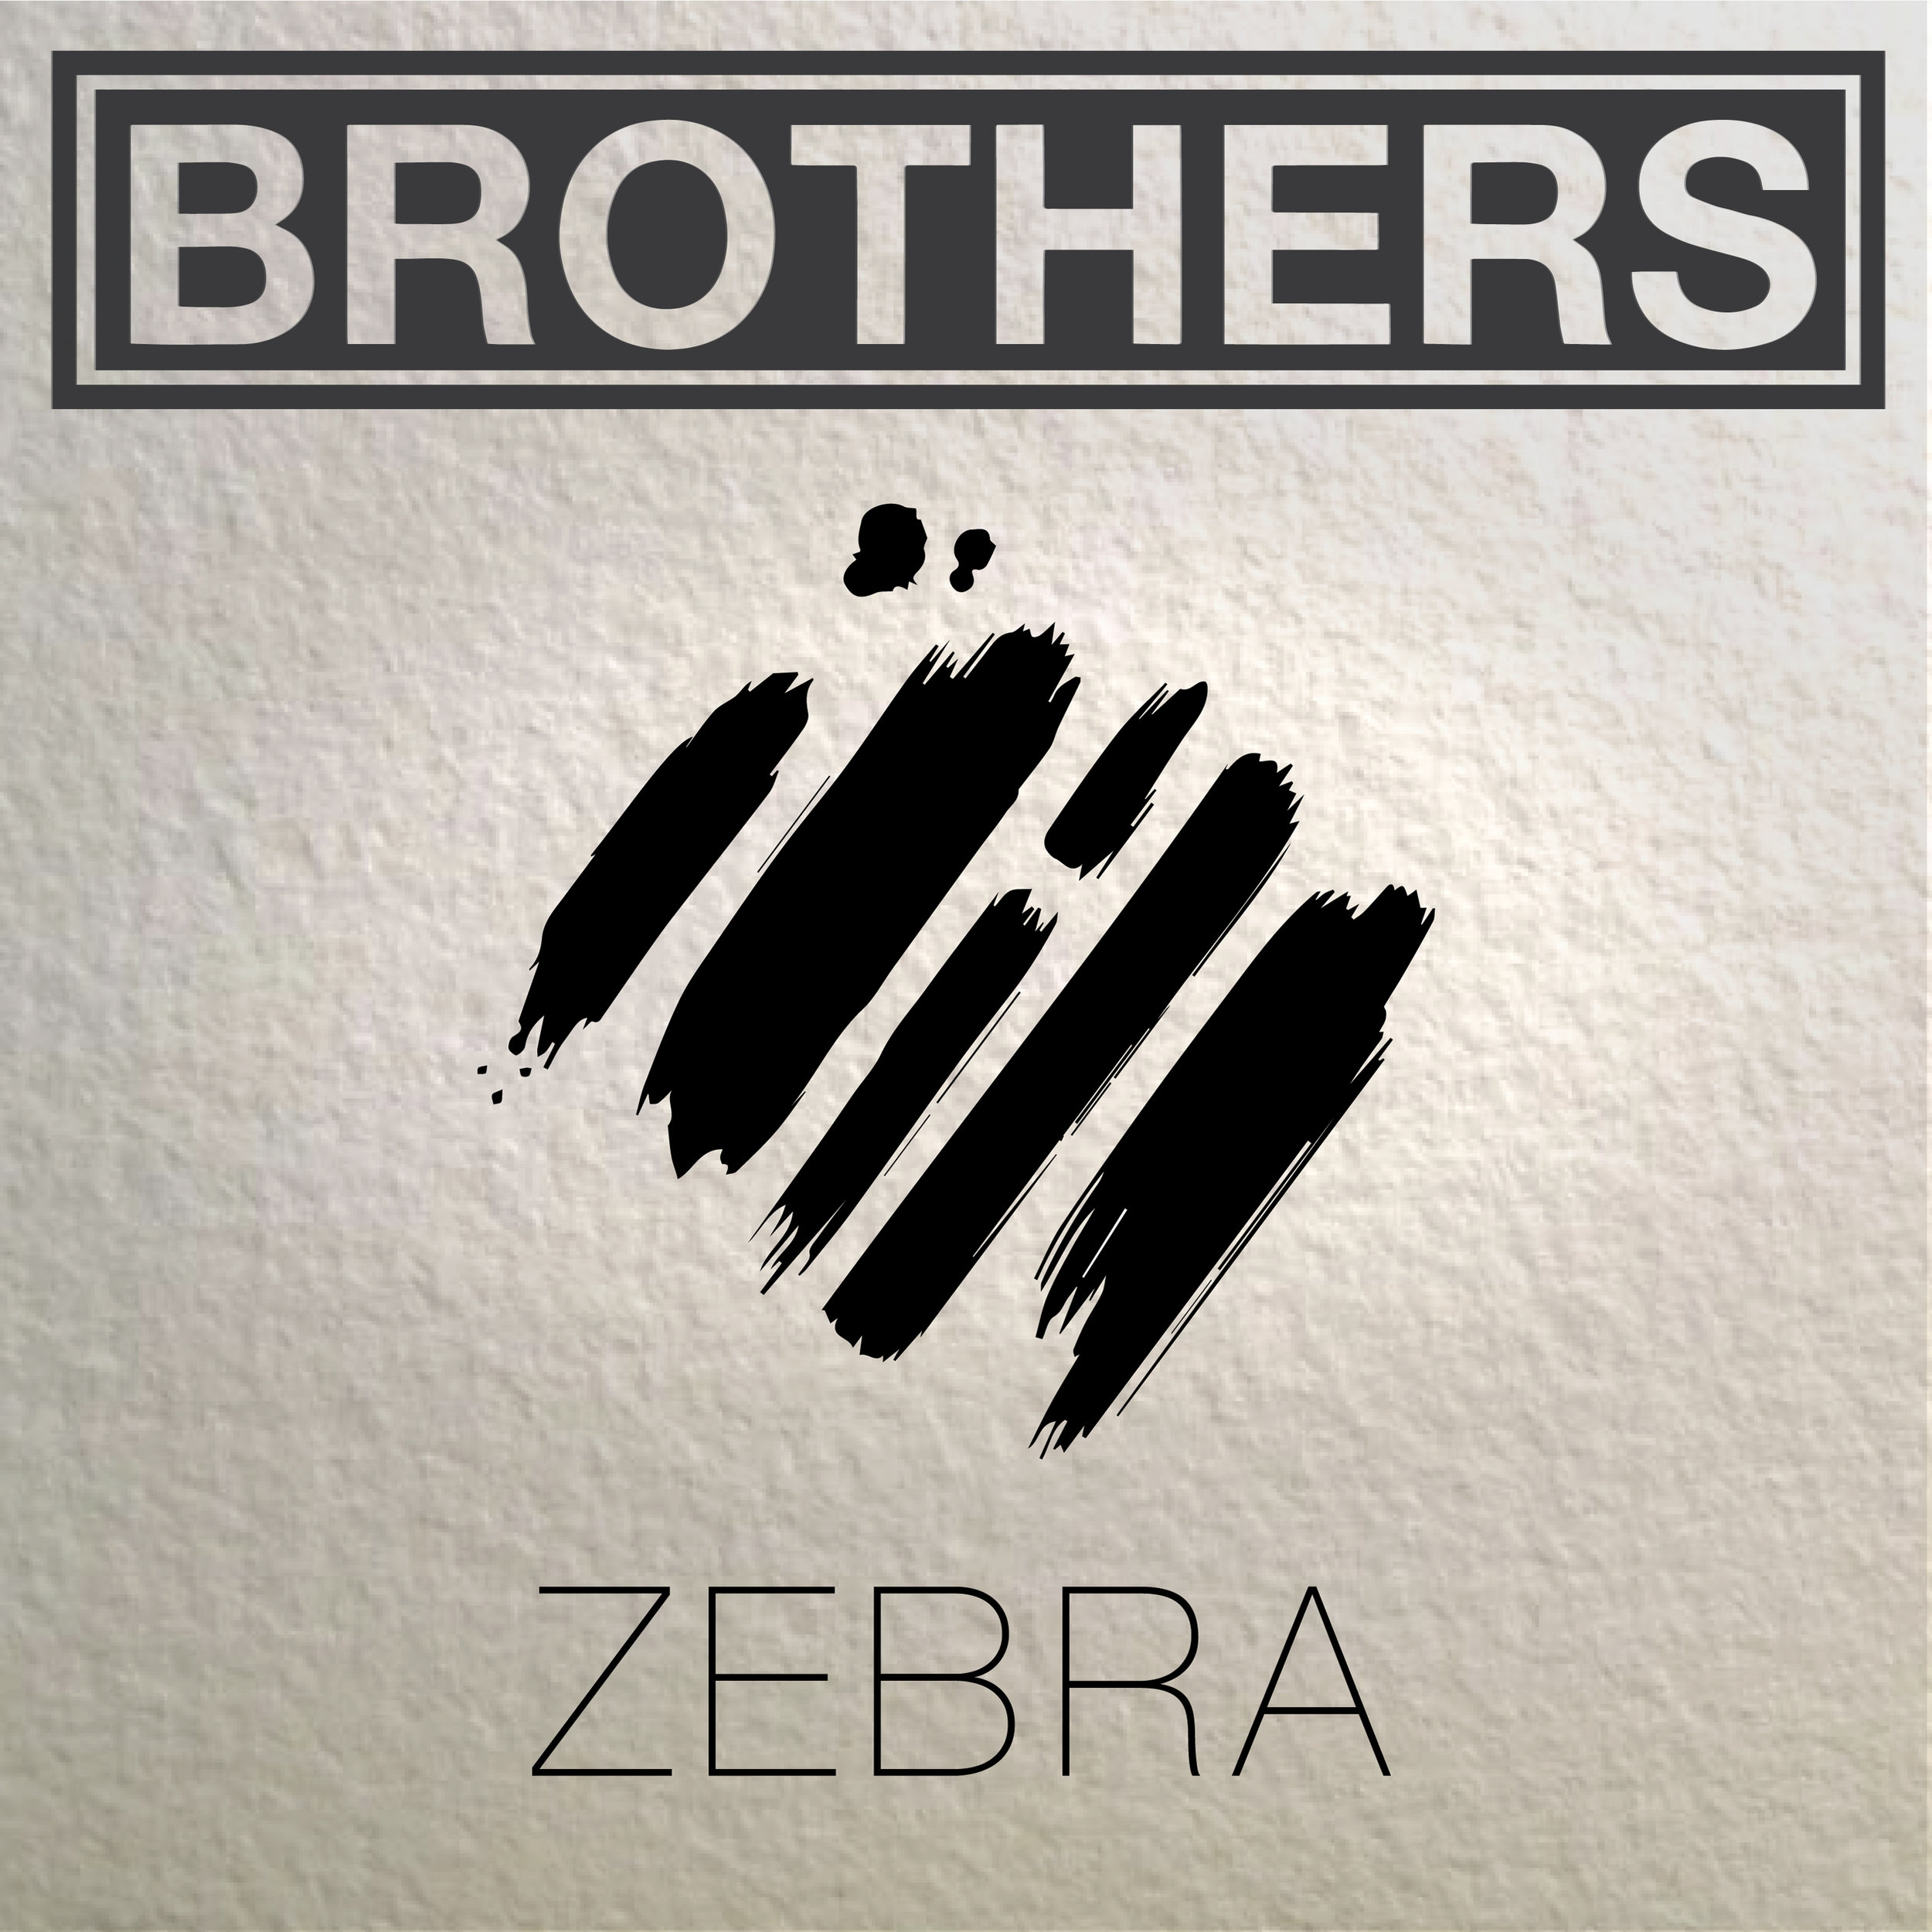 Zebra-ARTWORK.jpg